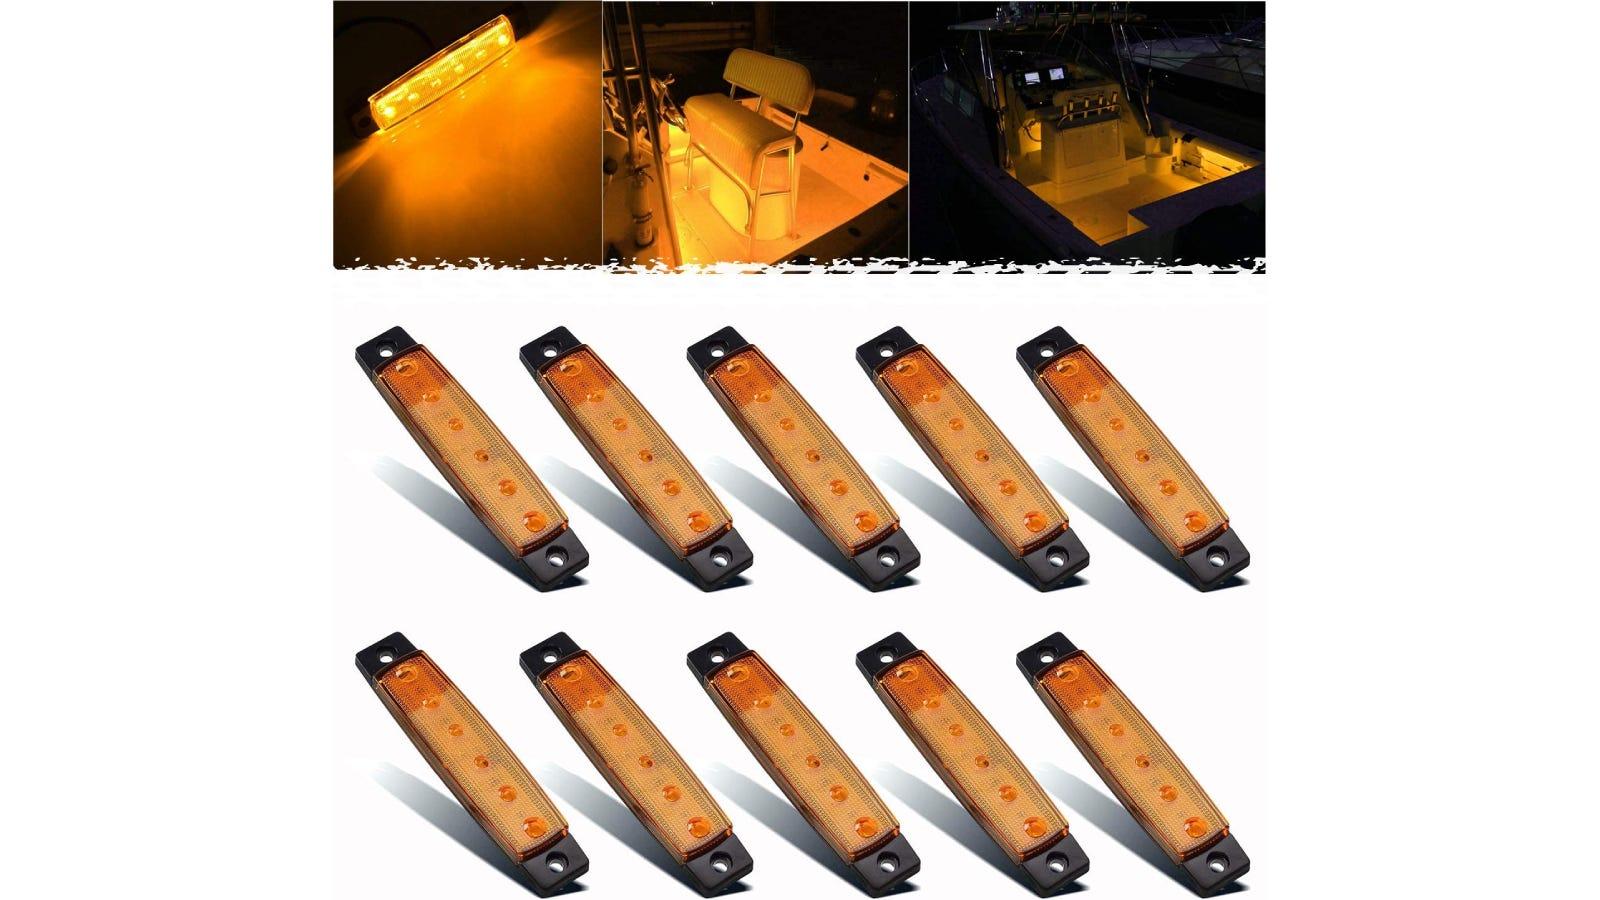 10 identical cockpit lights for your boat.